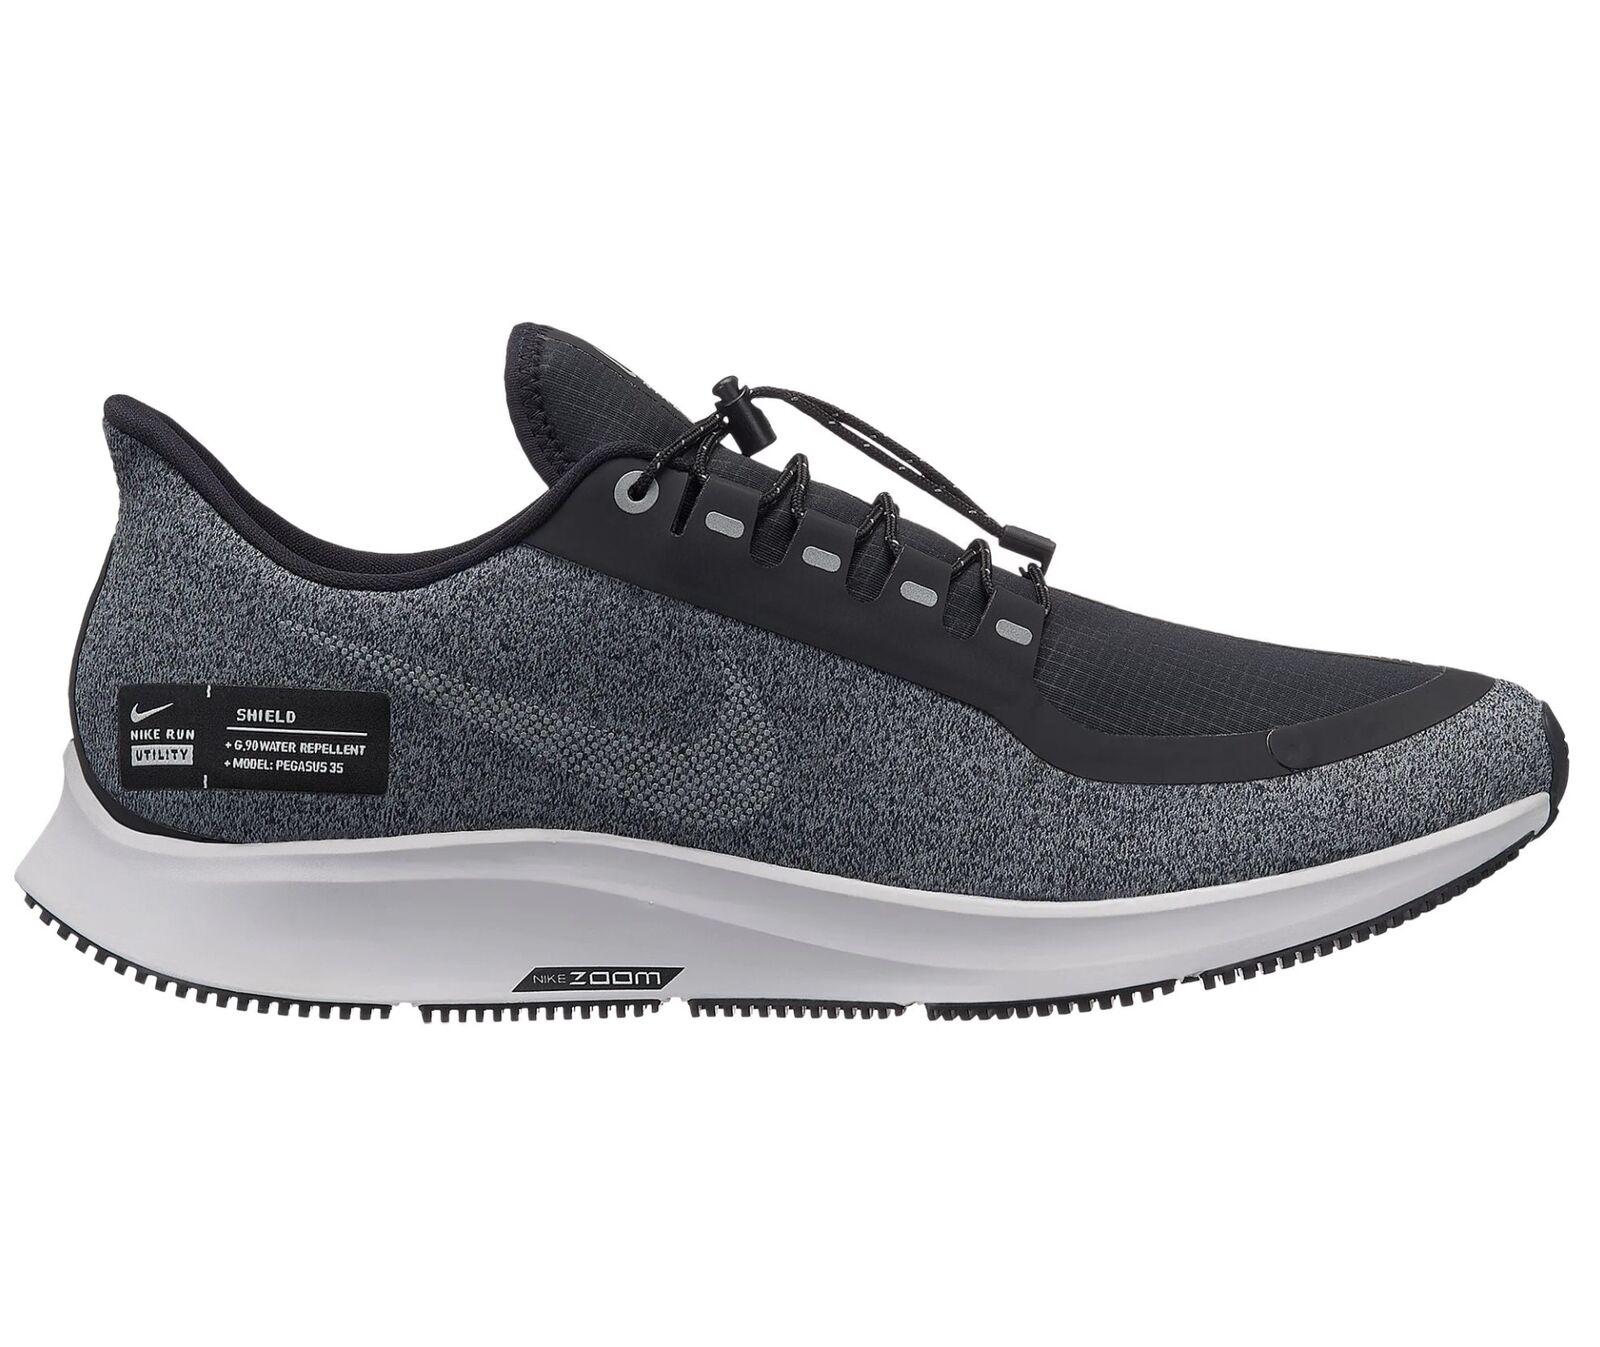 Nike Air Zoom Pegasus 35 Shield Mens AA1643-001 Black Grey Run shoes Size 13